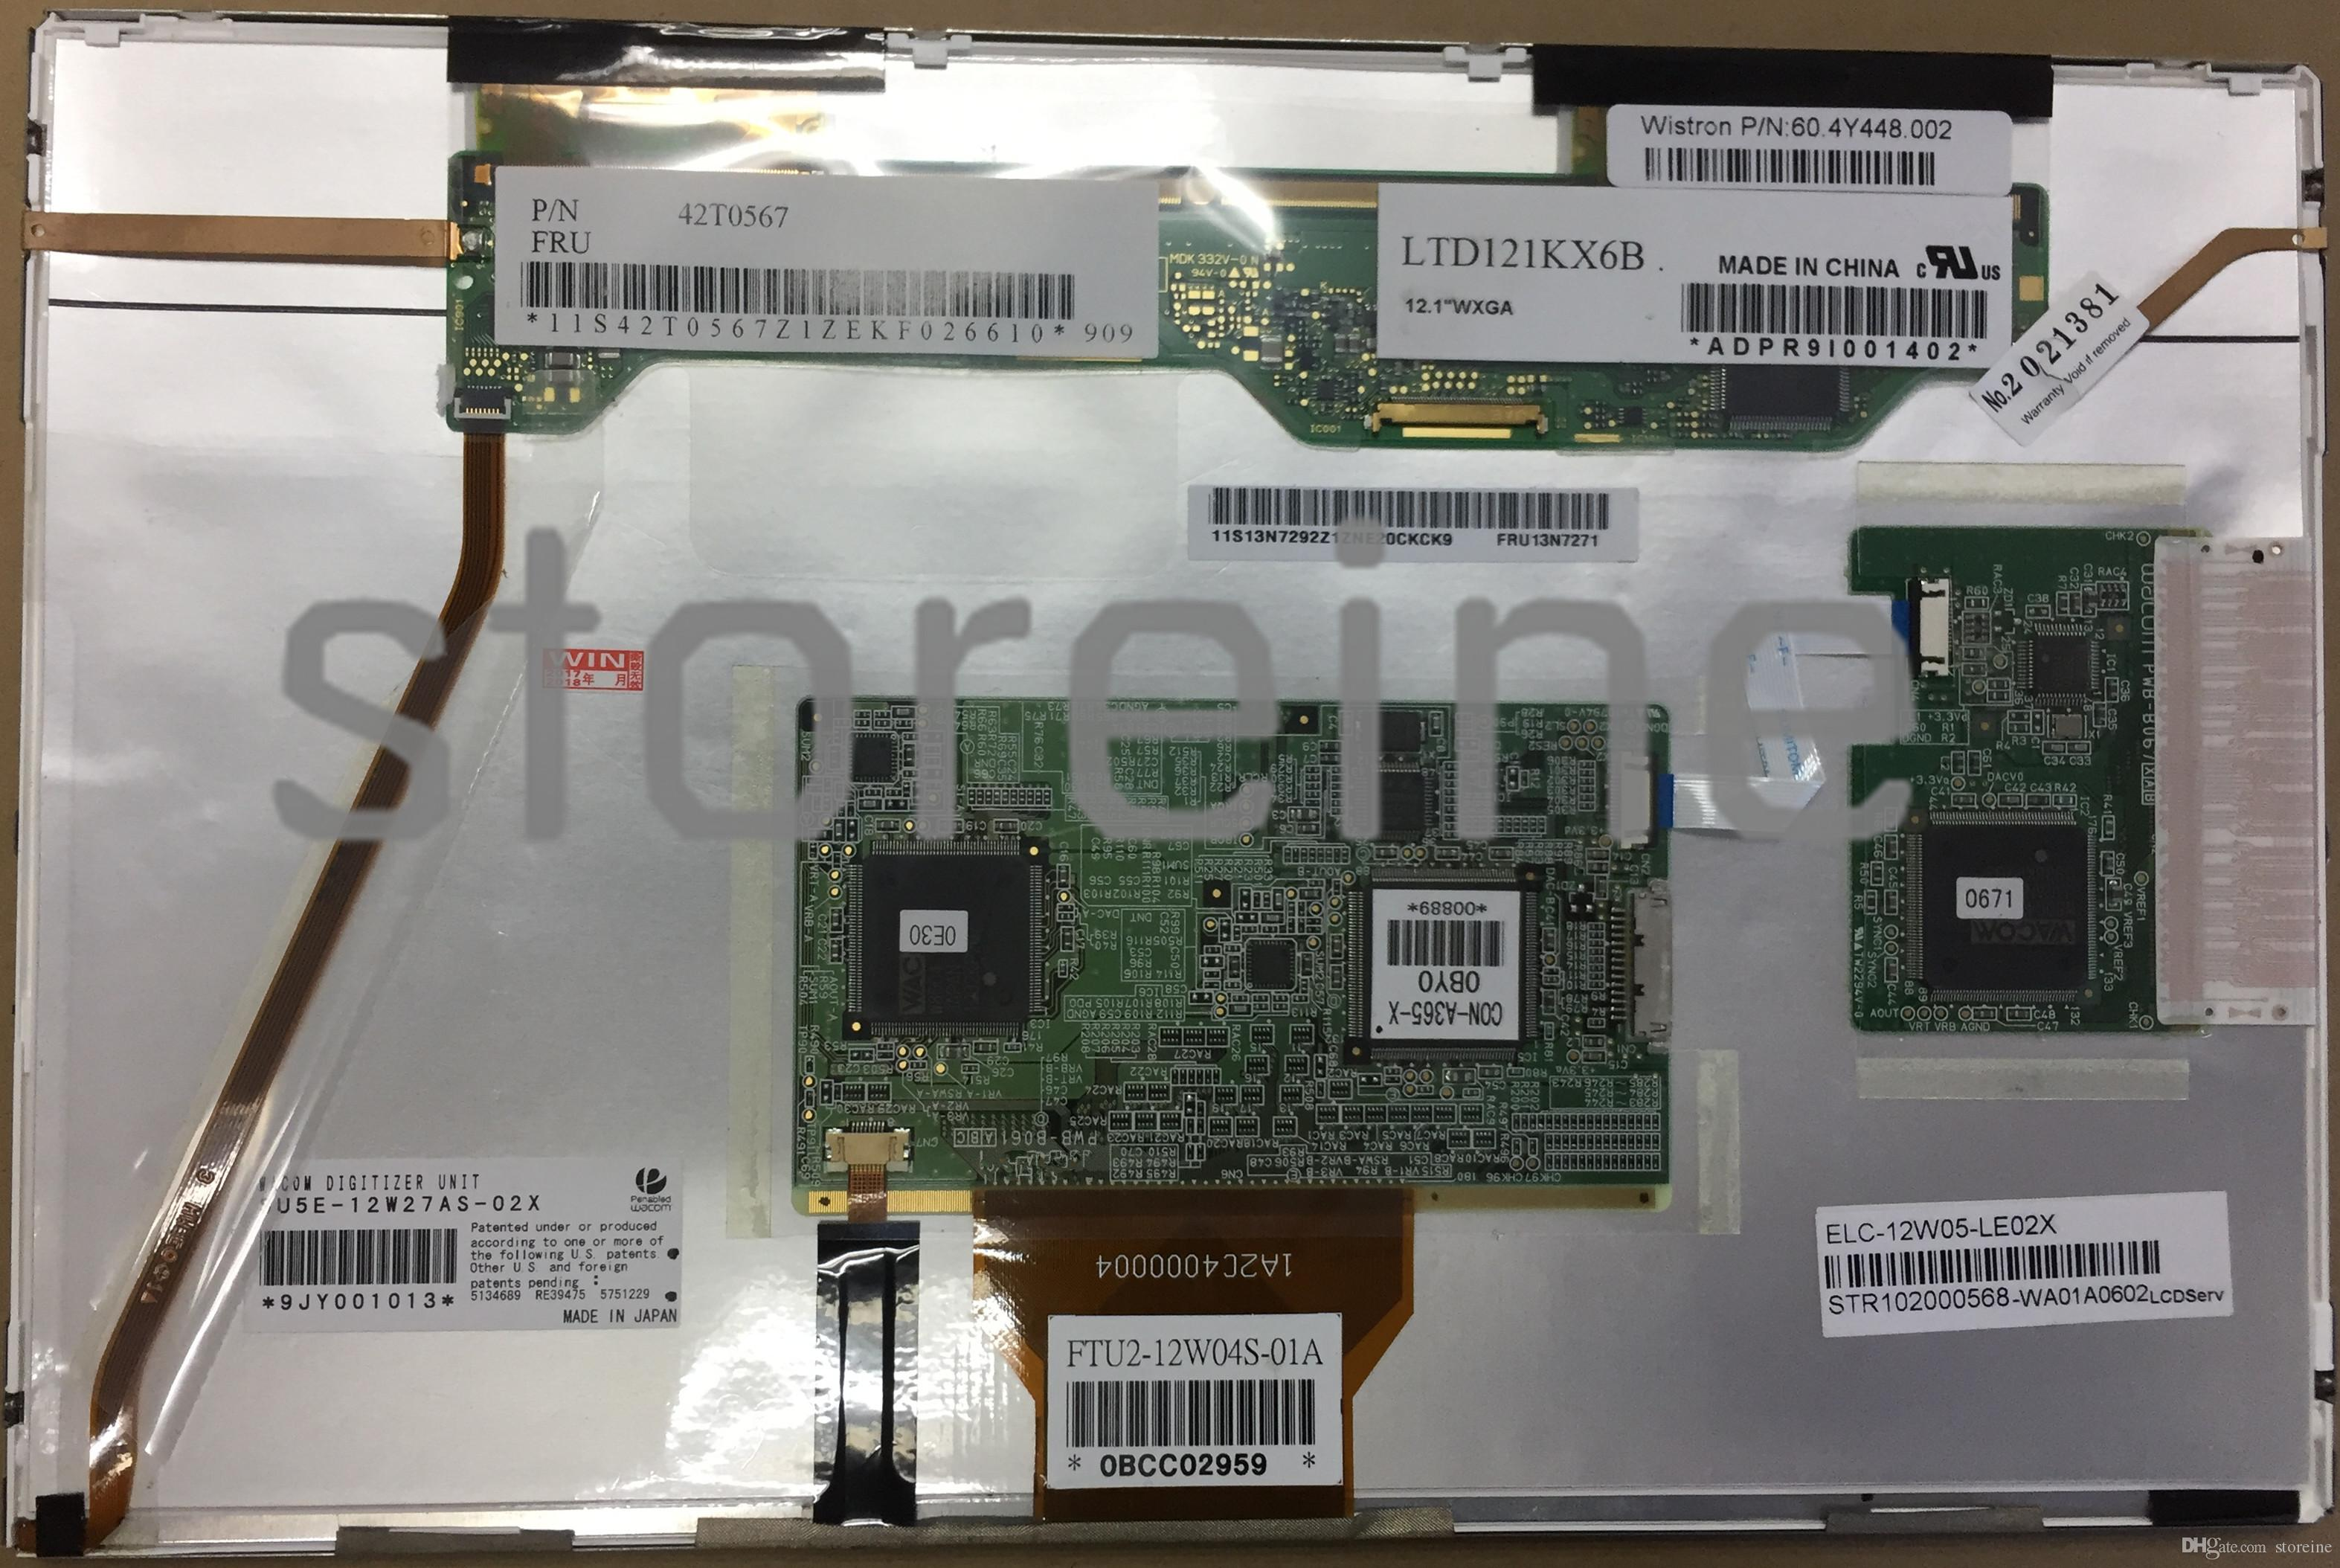 Lg121kx6b lcd ekran paneli dokunmatik ekran digitizer cam lenovo thinkpad x201 x200 tablet p / n 42t0567